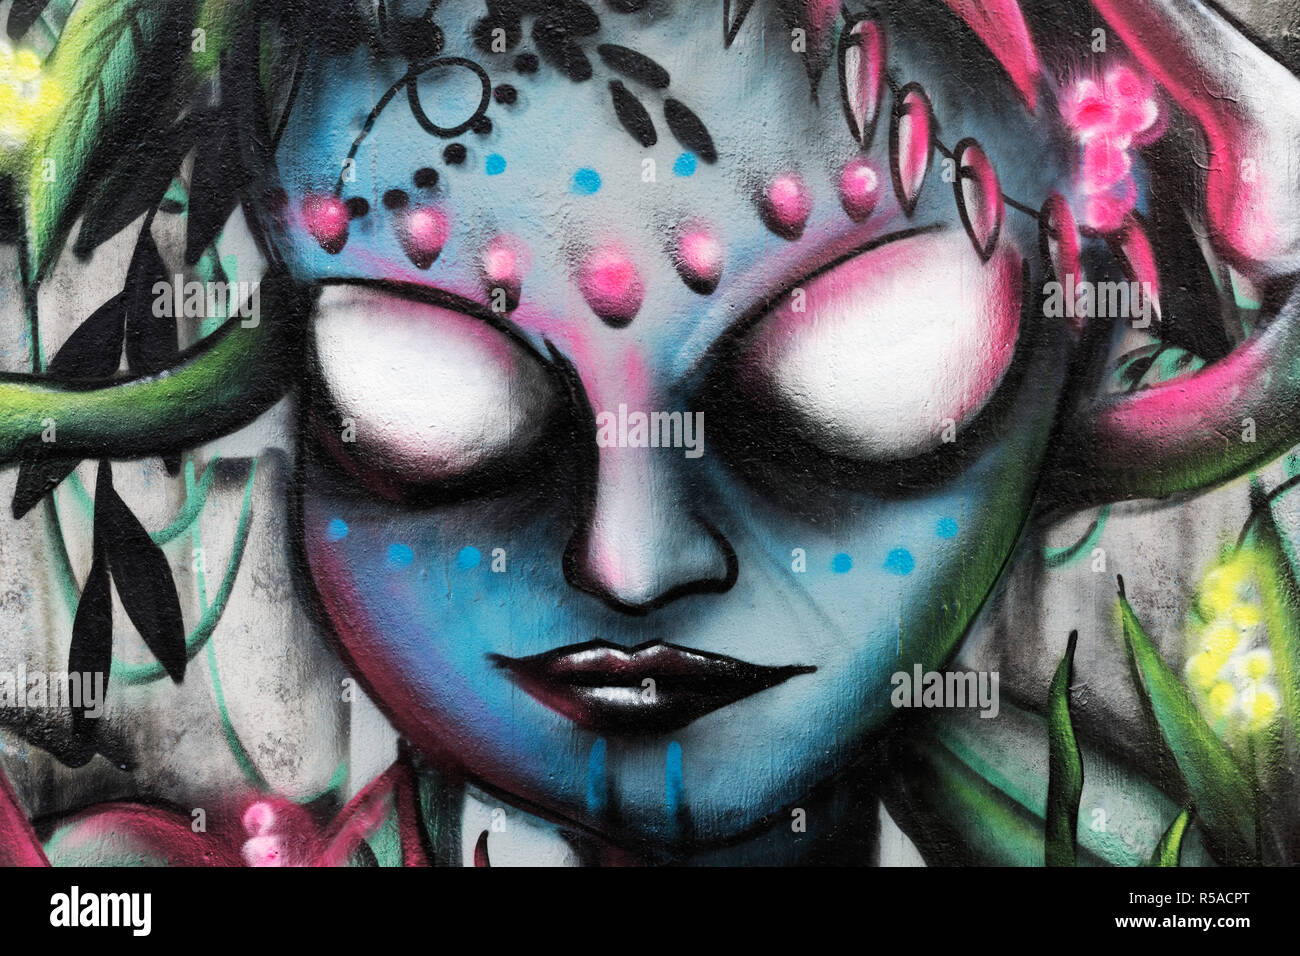 Graffiti, Woman without eyes, Headdress from snakes and bones, Portrait, Fantasy, Streetart, Hall of Fame Düsseldorf - Stock Image